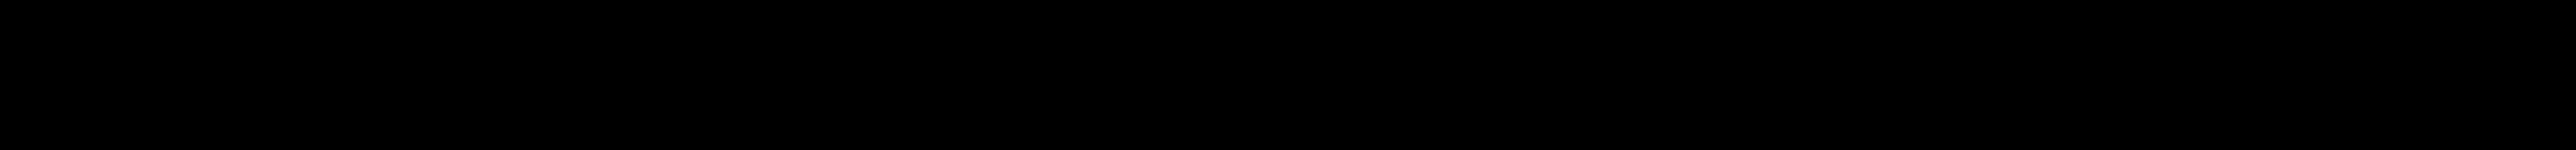 SpaceandPeople Logo